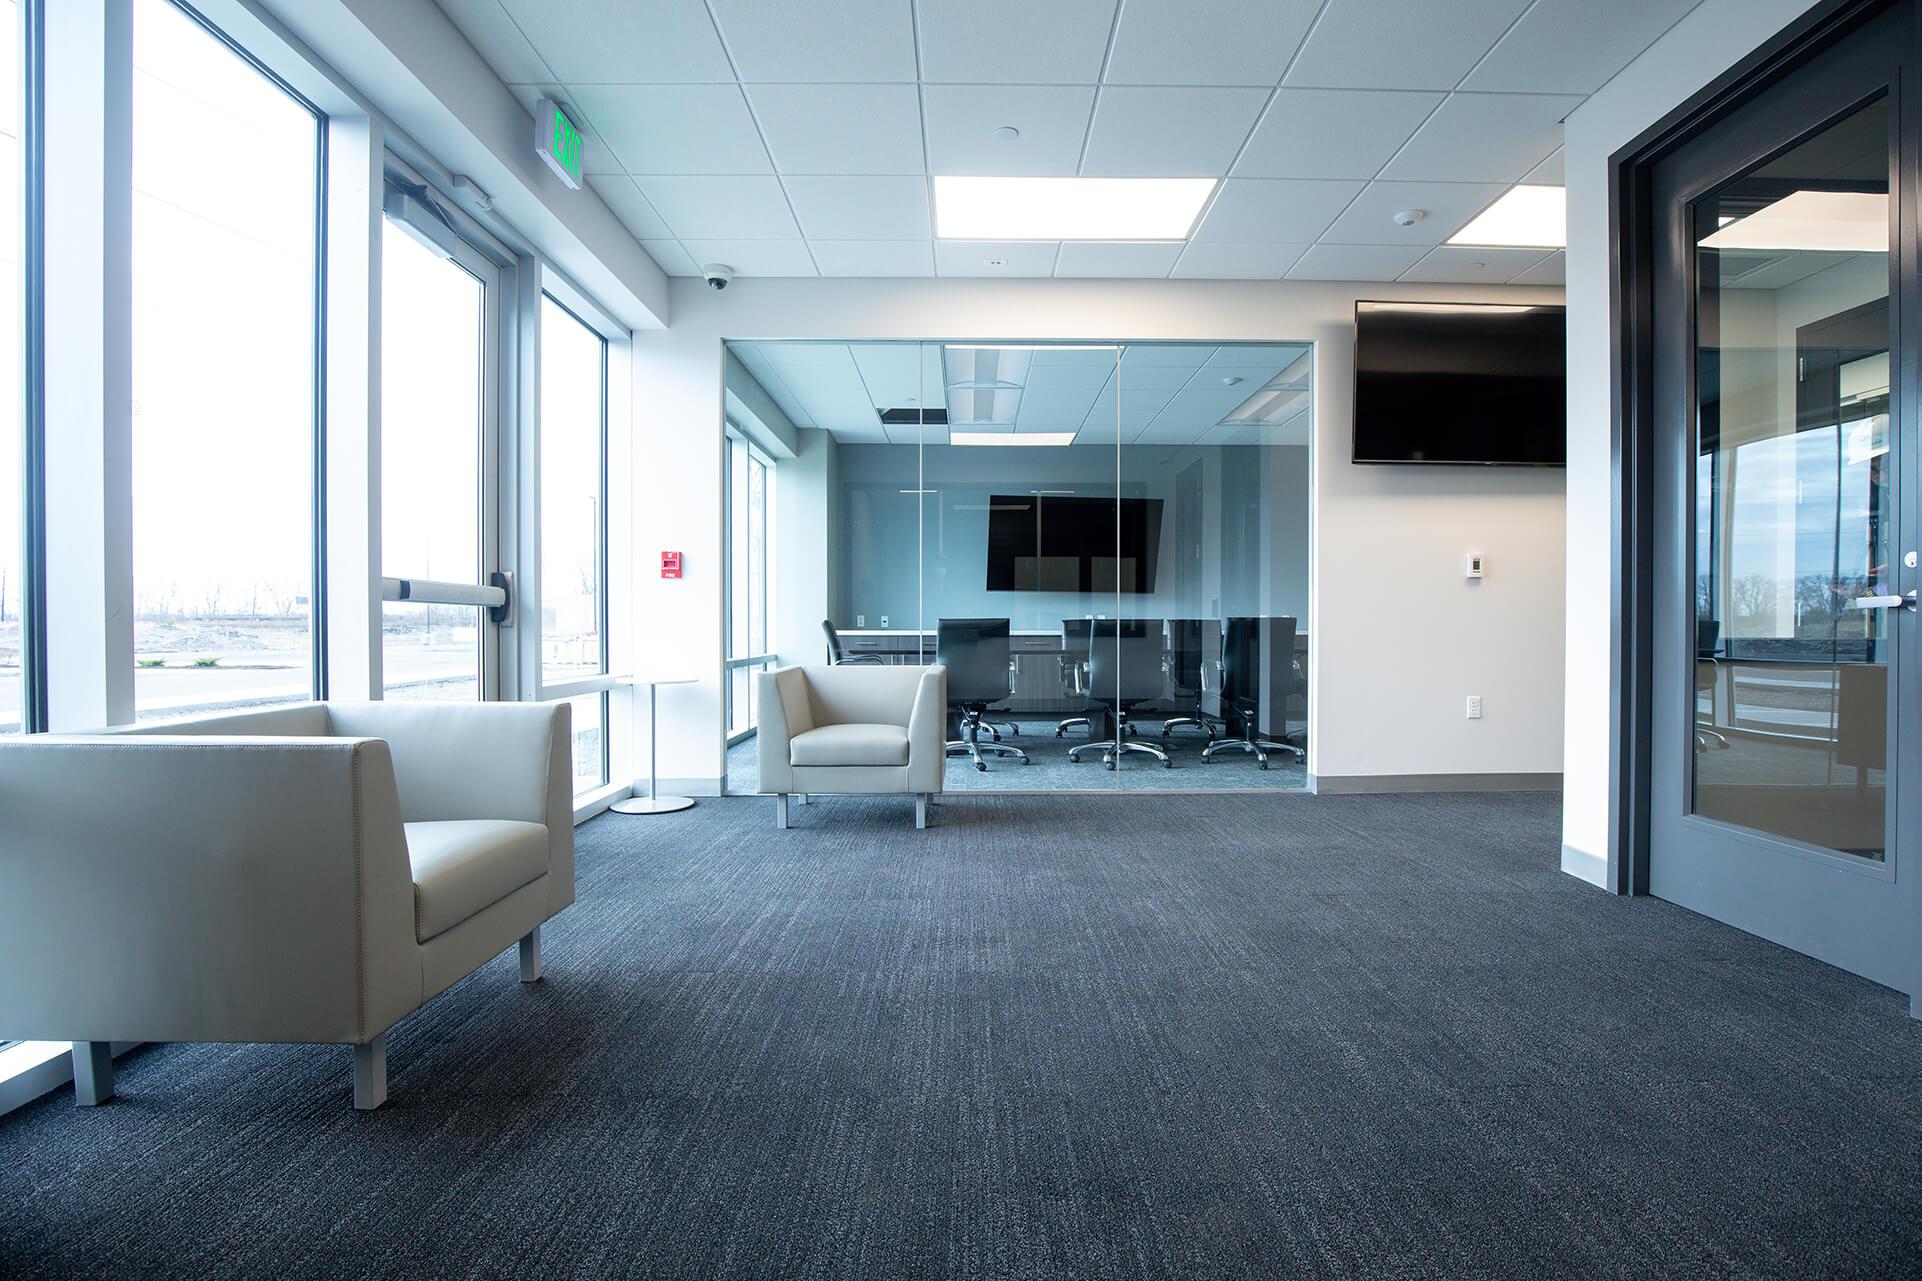 Digital Crossroad Lobby